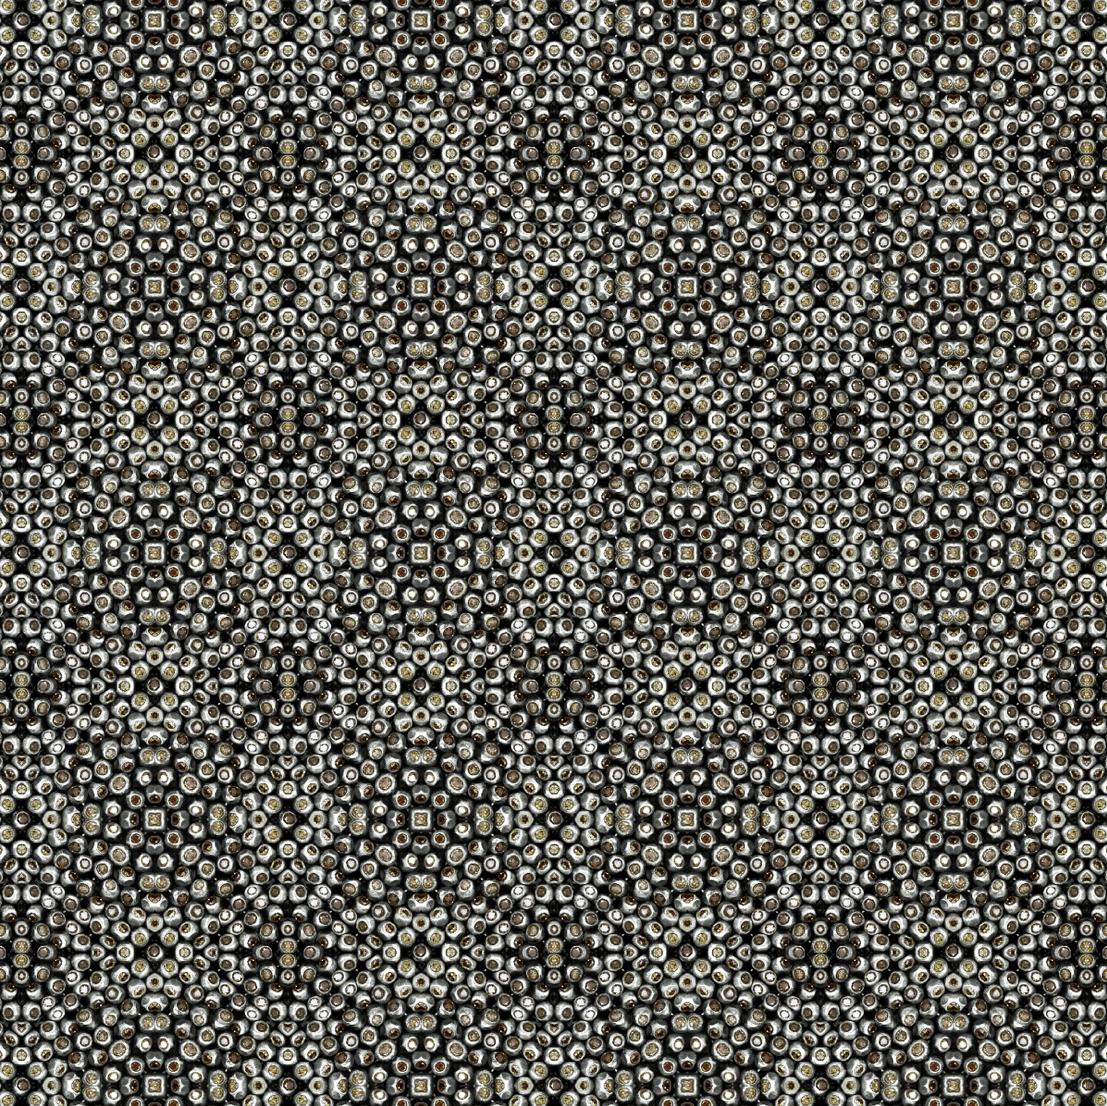 Stefan Hengst, Boregaard Collection, Diamond Caviar Silvergreen